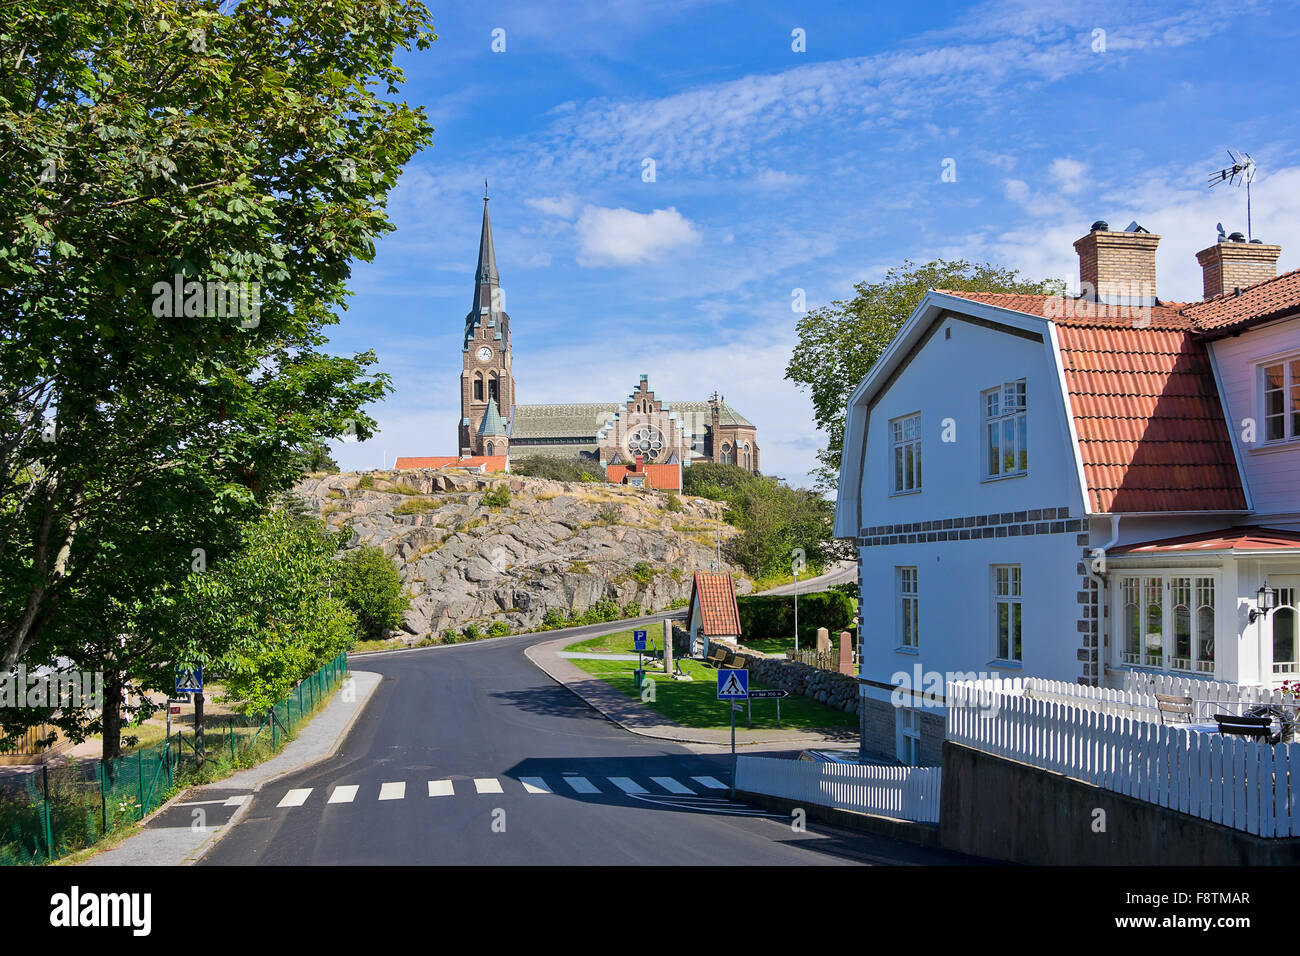 CHURCH OF LYSEKIL, BOHUSLAN, SWEDEN. - Stock Image